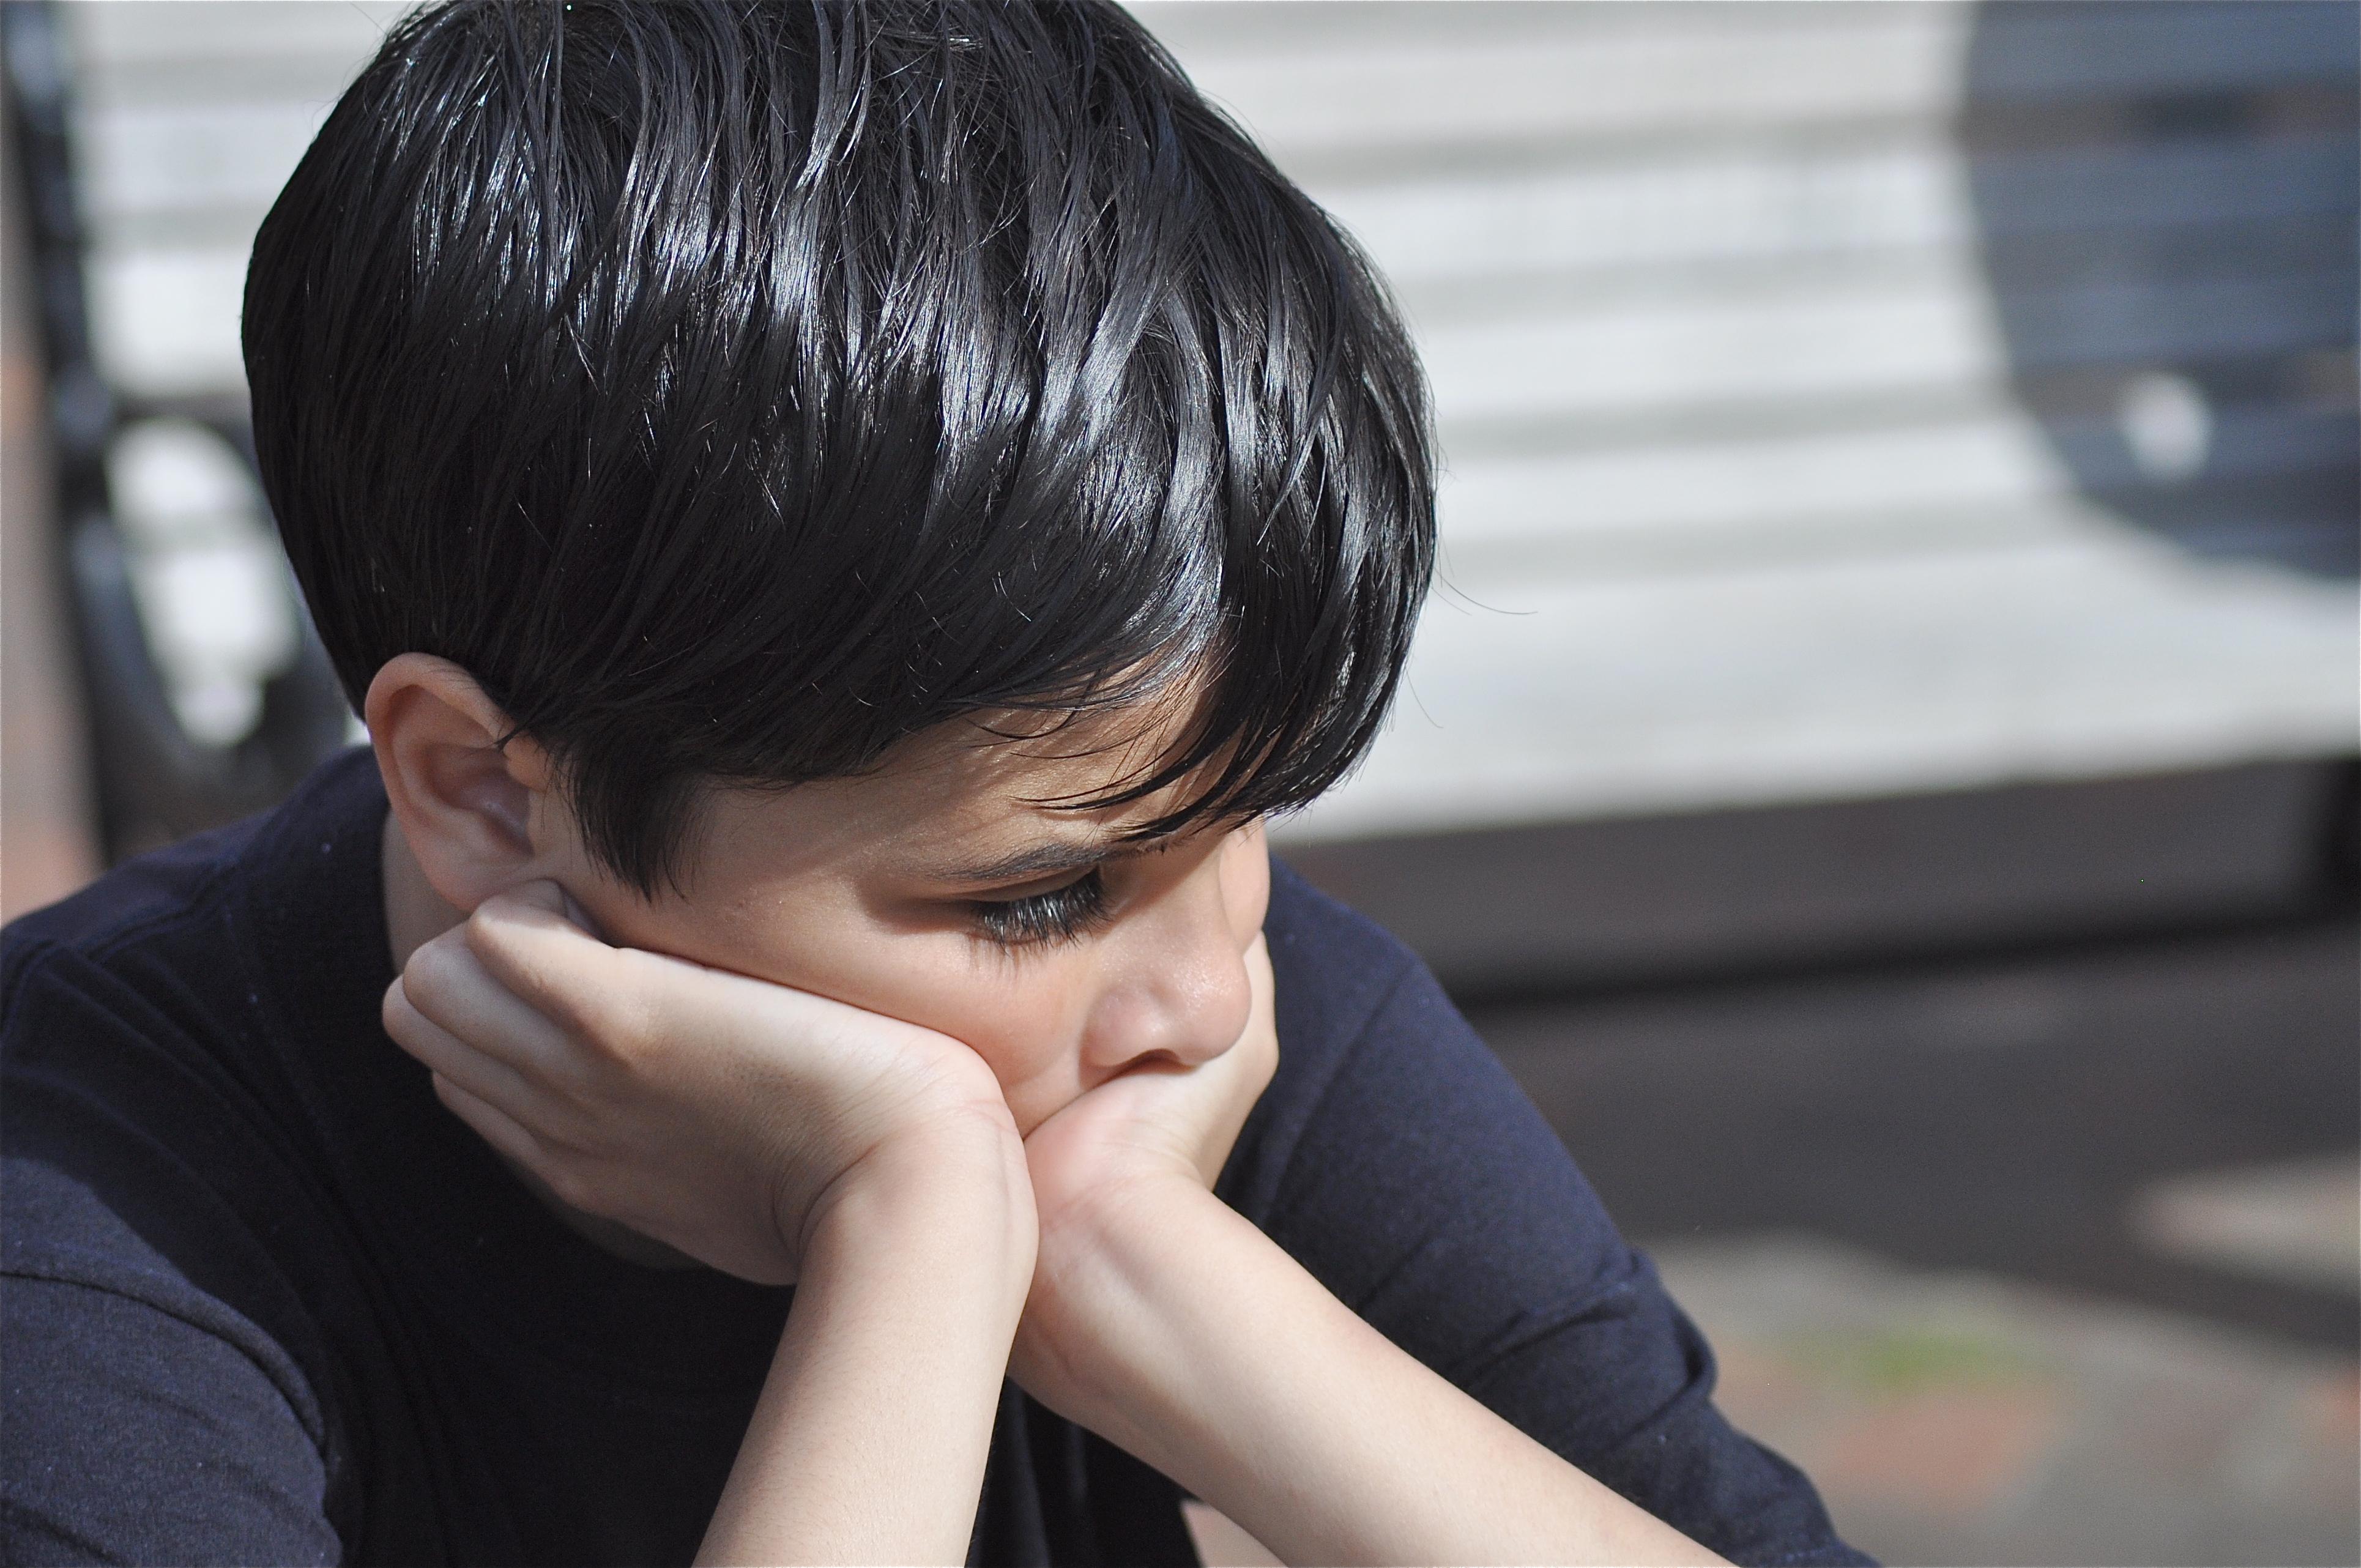 Childhood wounds sad boy